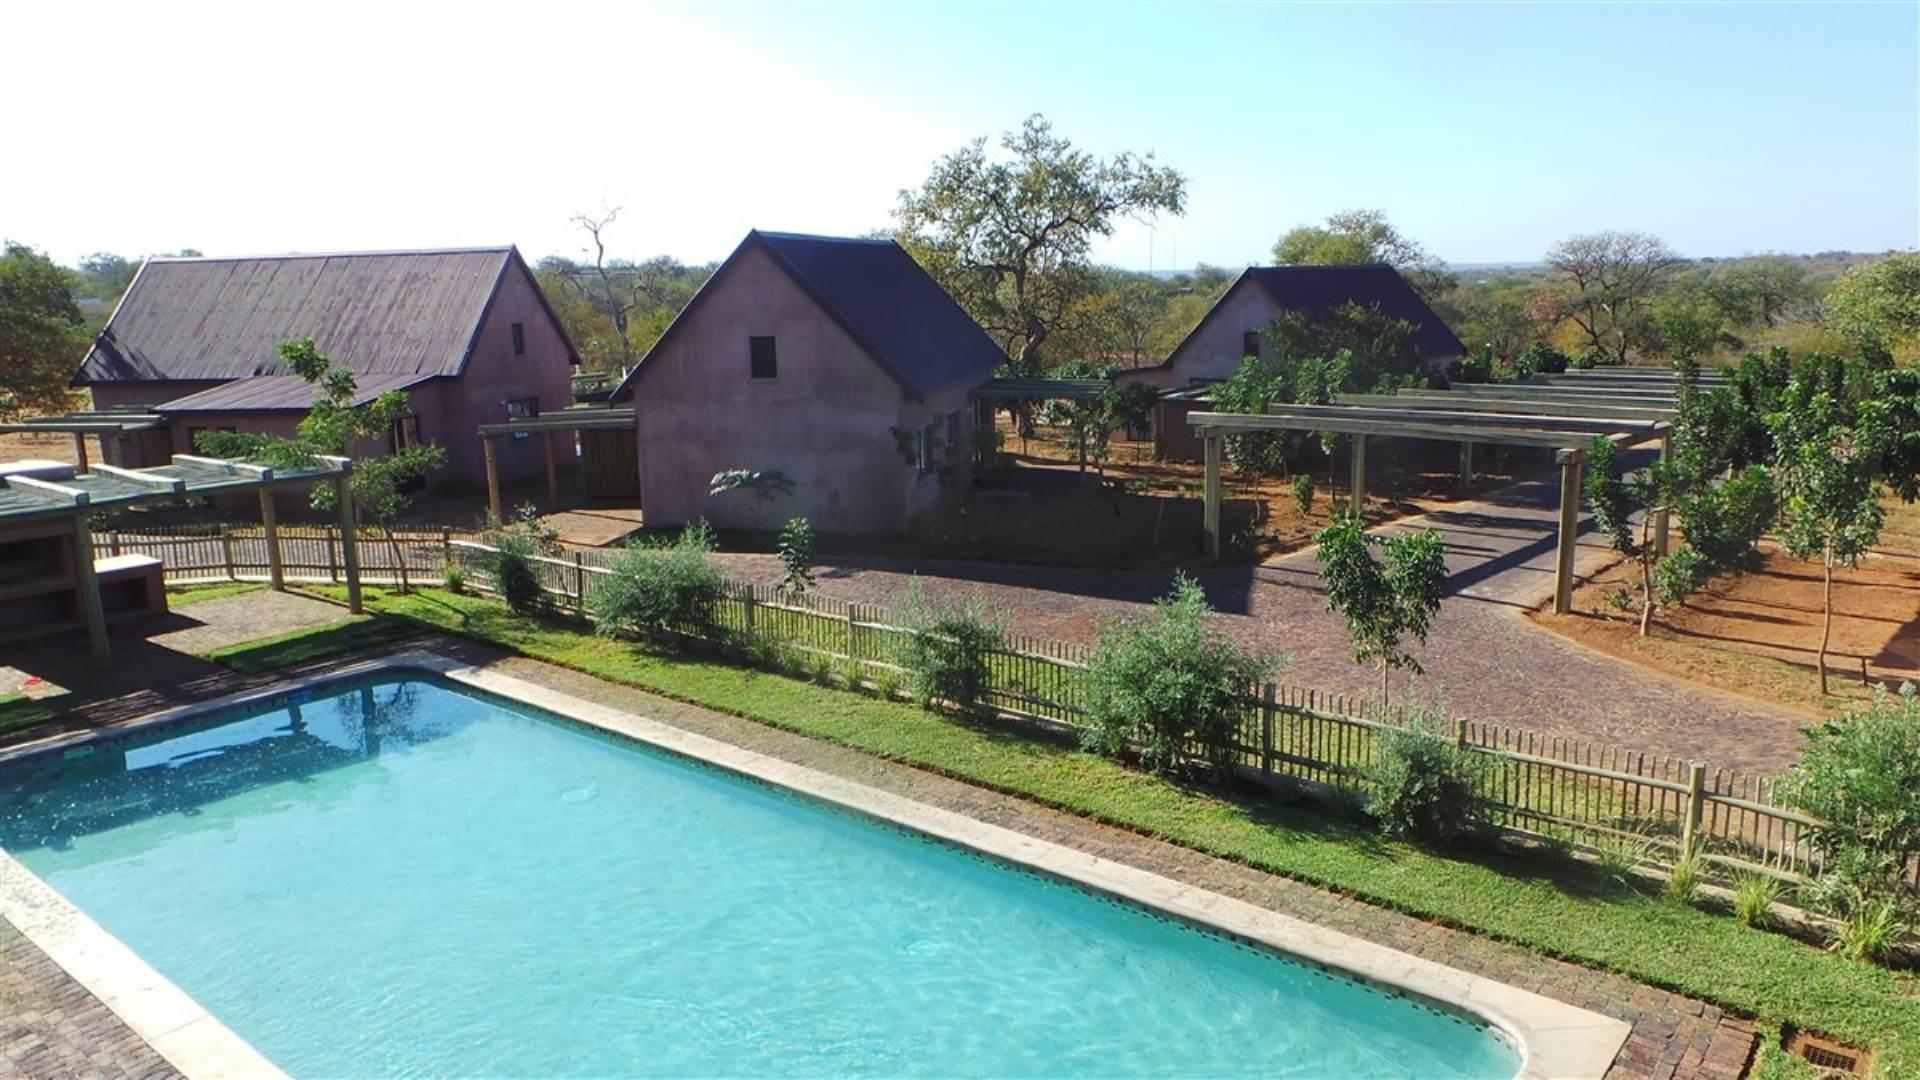 1 BedroomApartment Pending Sale In Hoedspruit Wildlife Estate